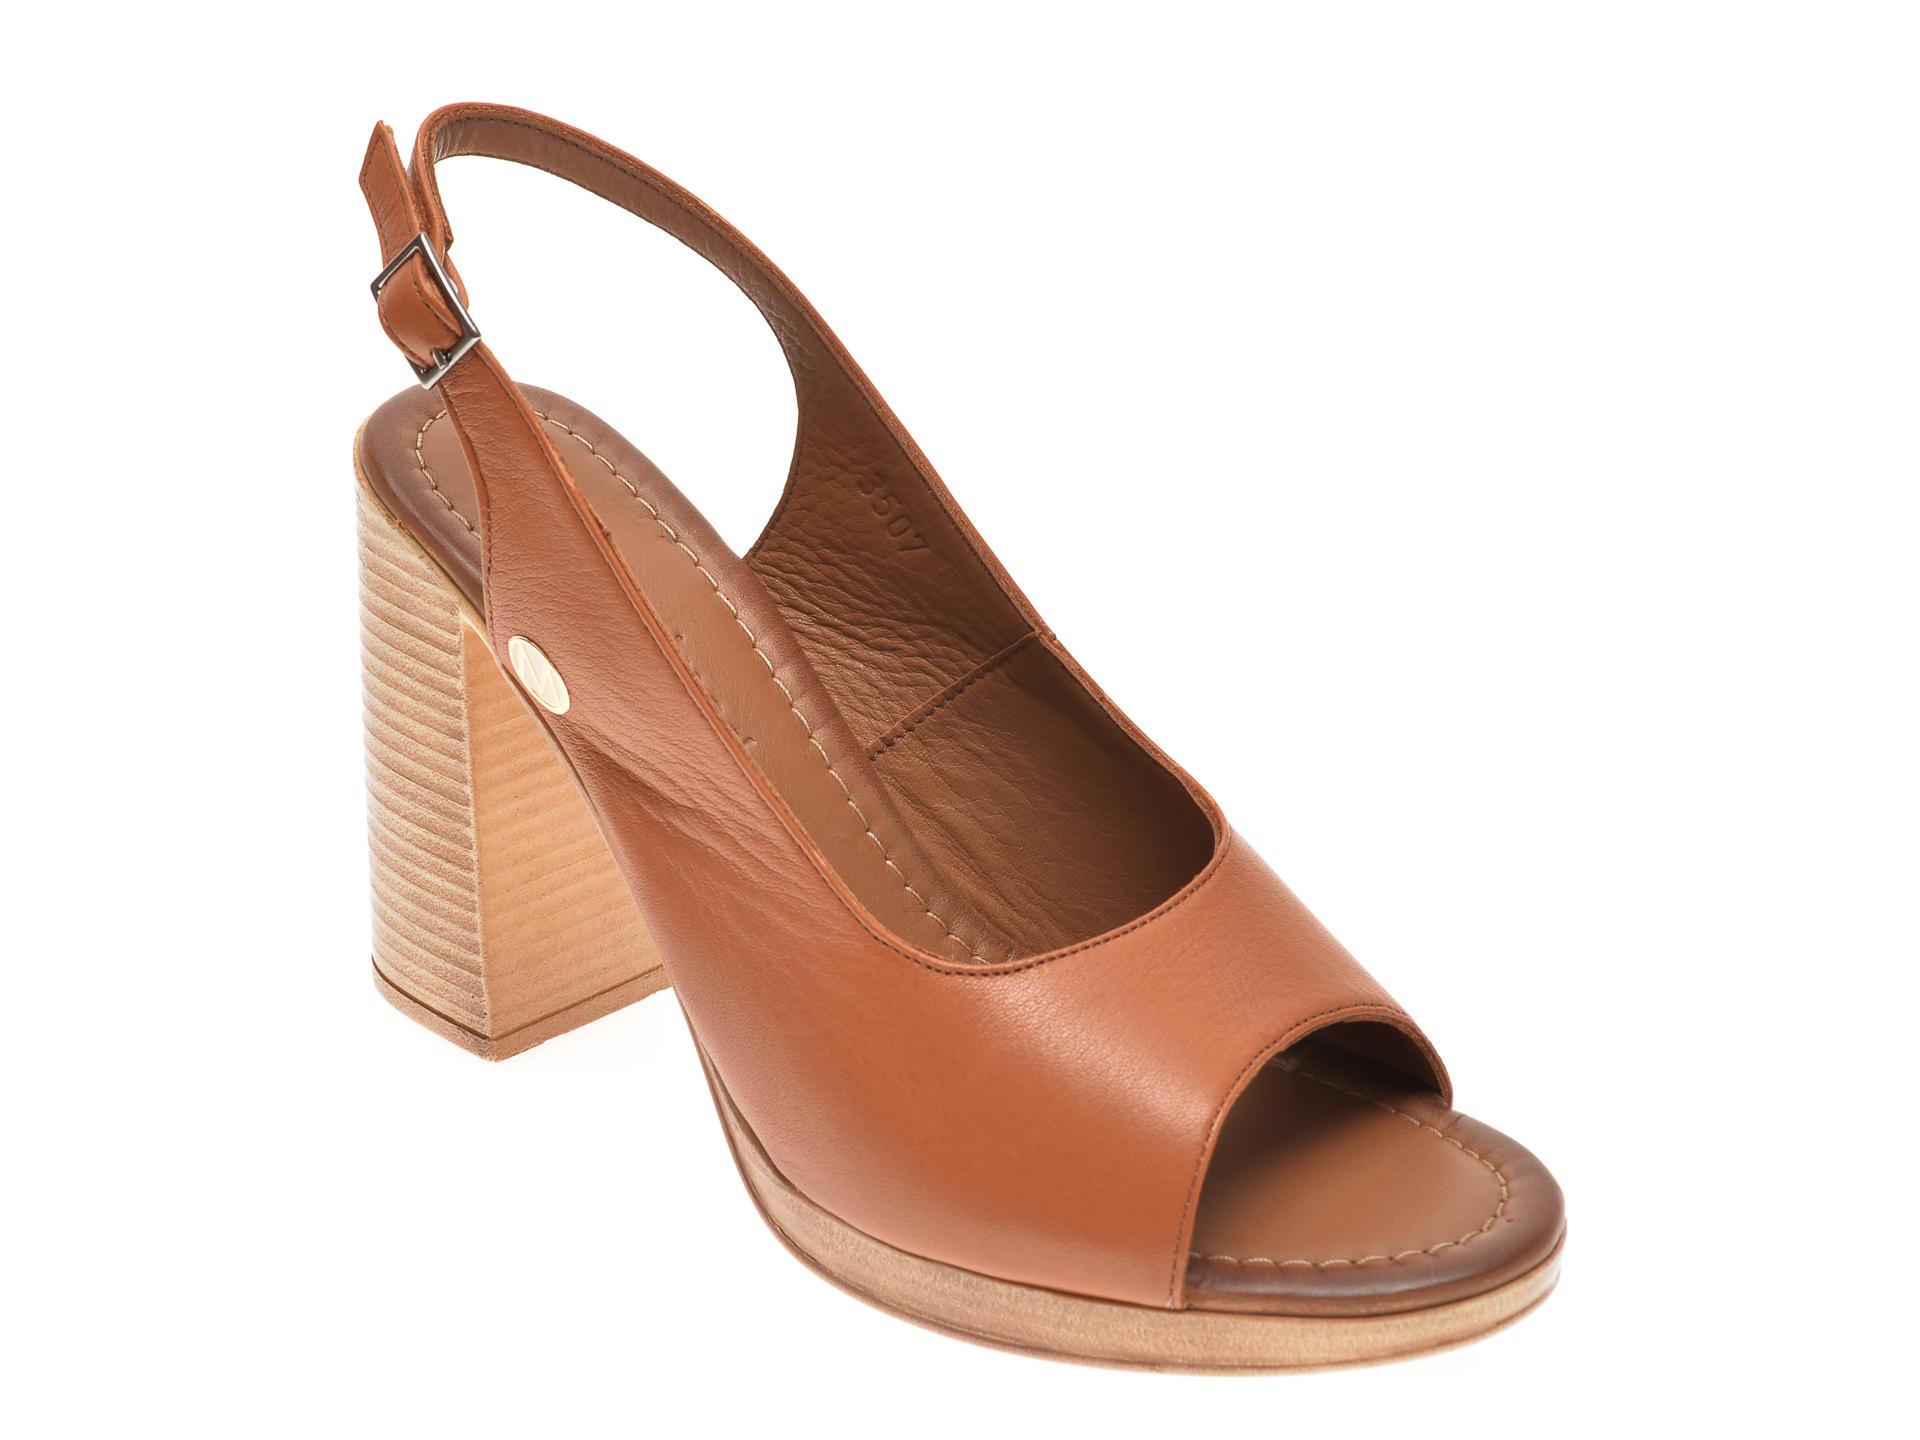 Sandale MESSIMODA maro, 20Y3507, din piele naturala New